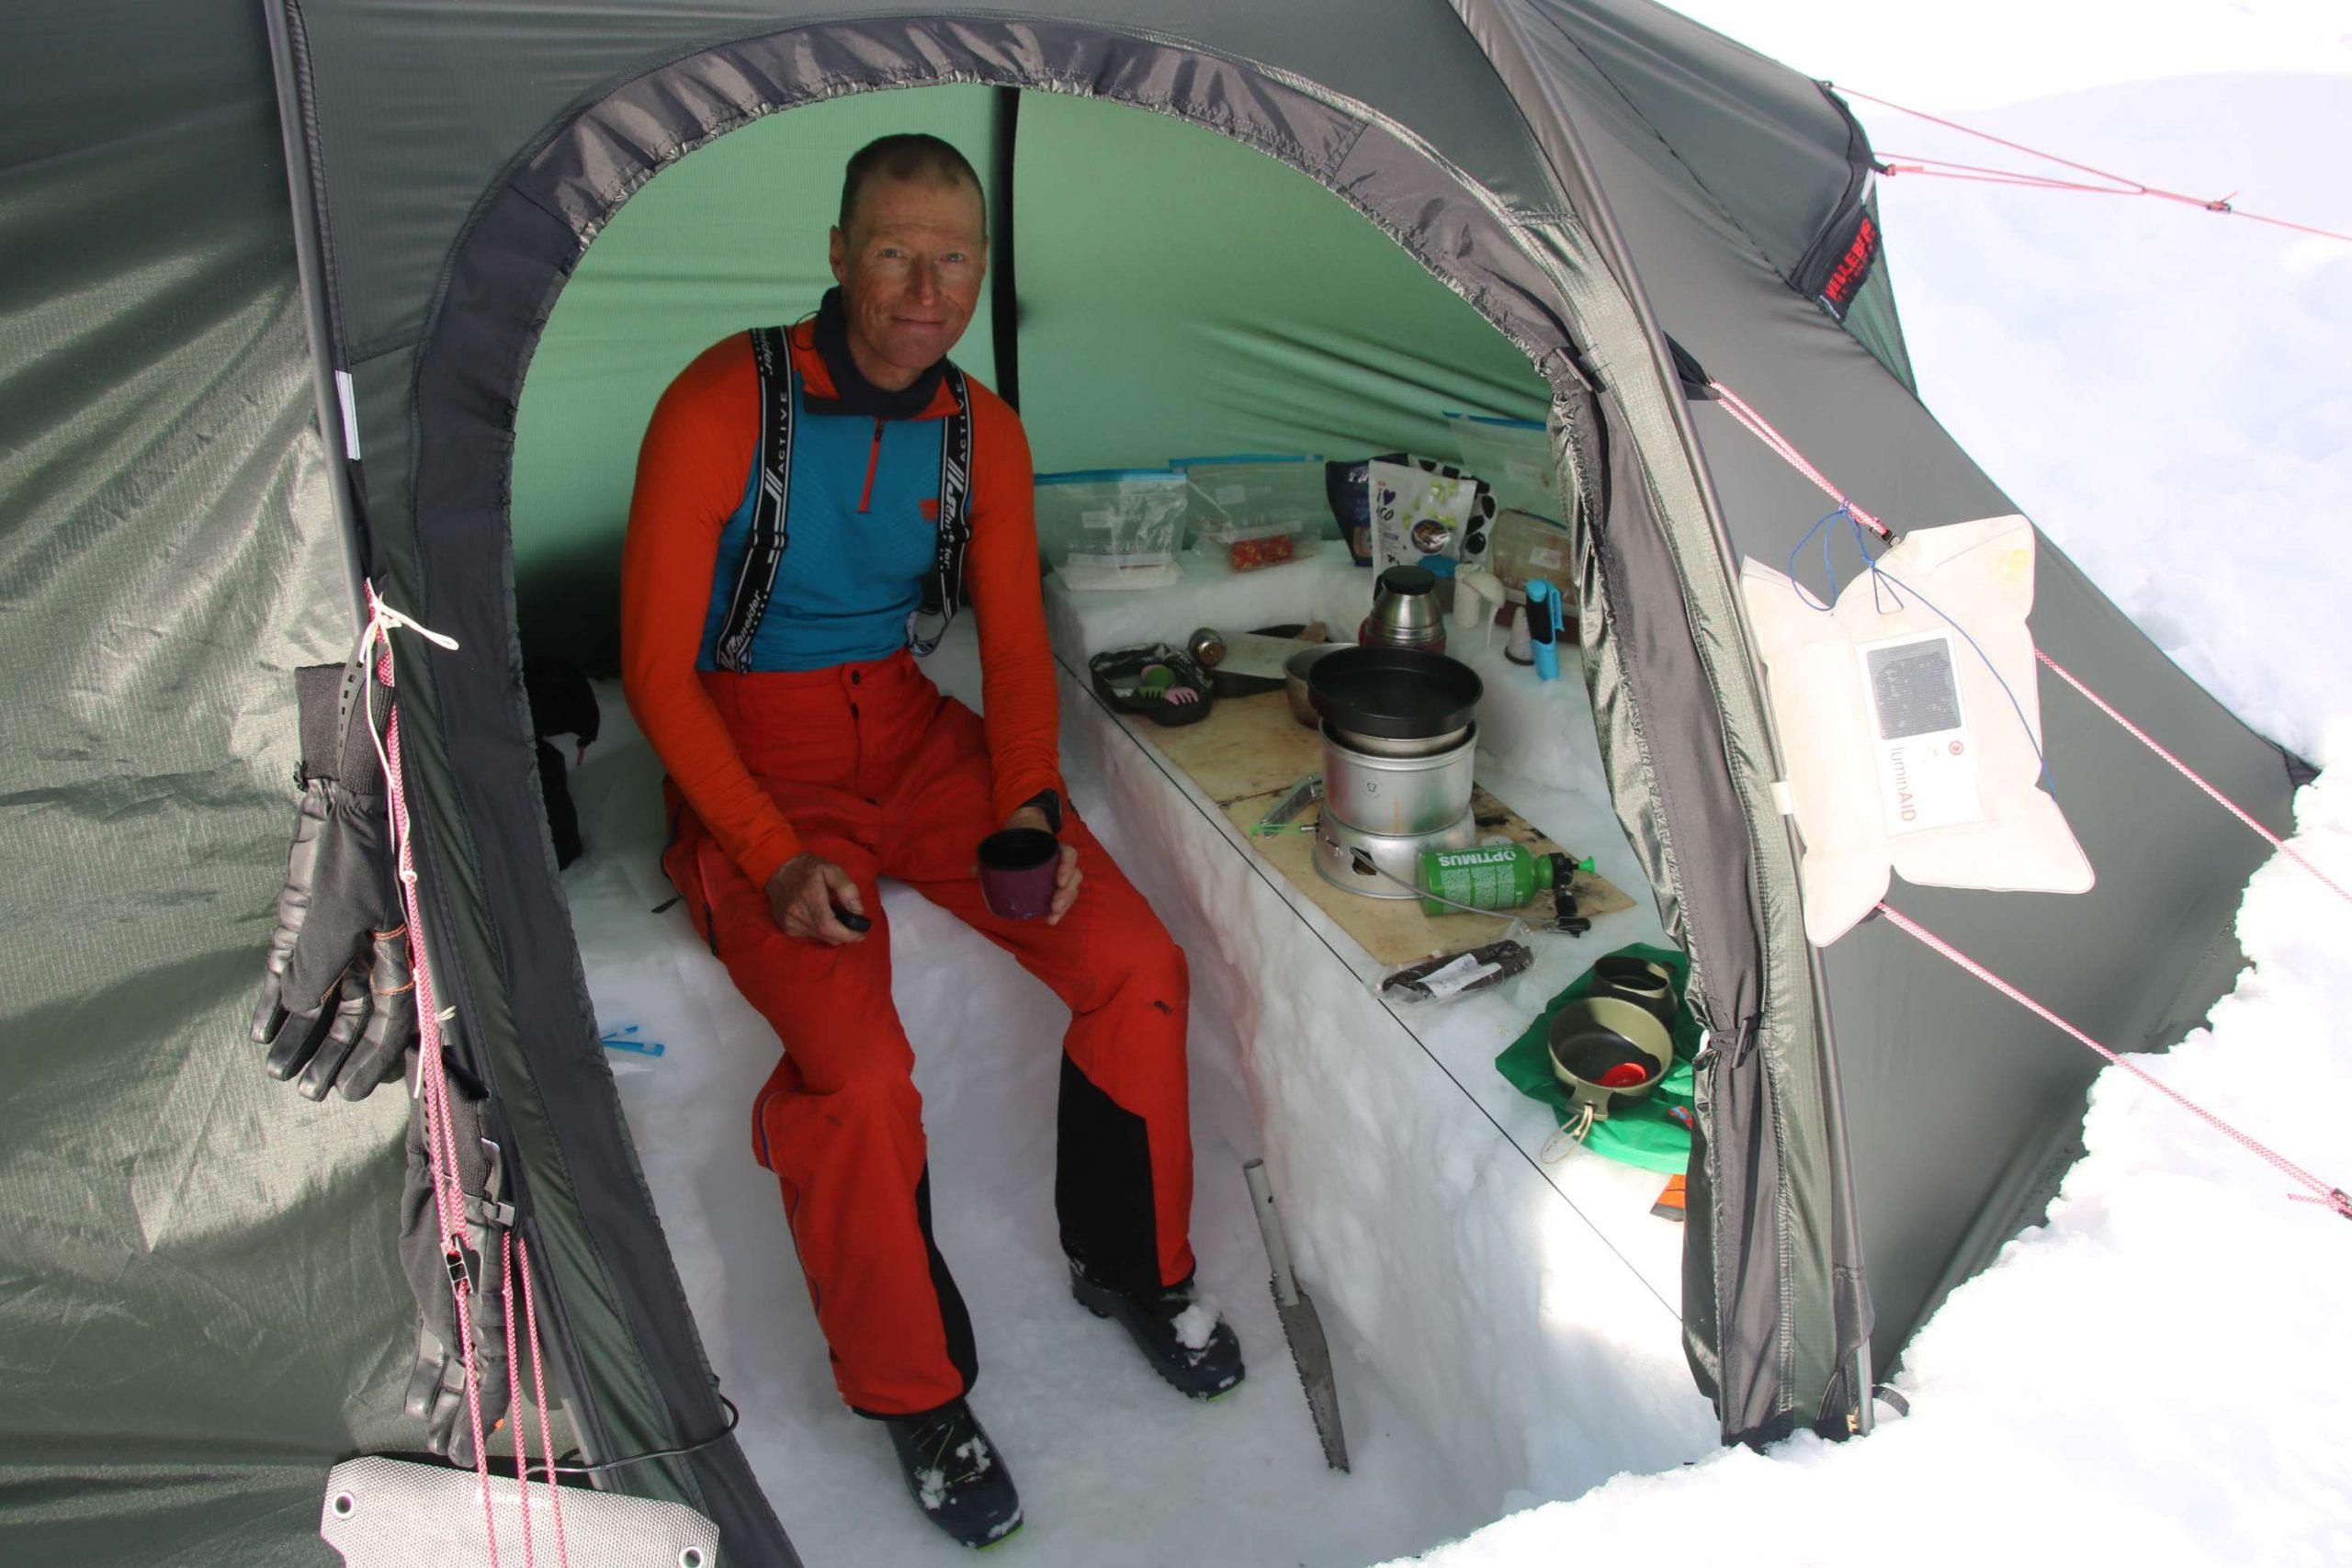 Wintercamp im Sarek-Nationalpar,Lappland